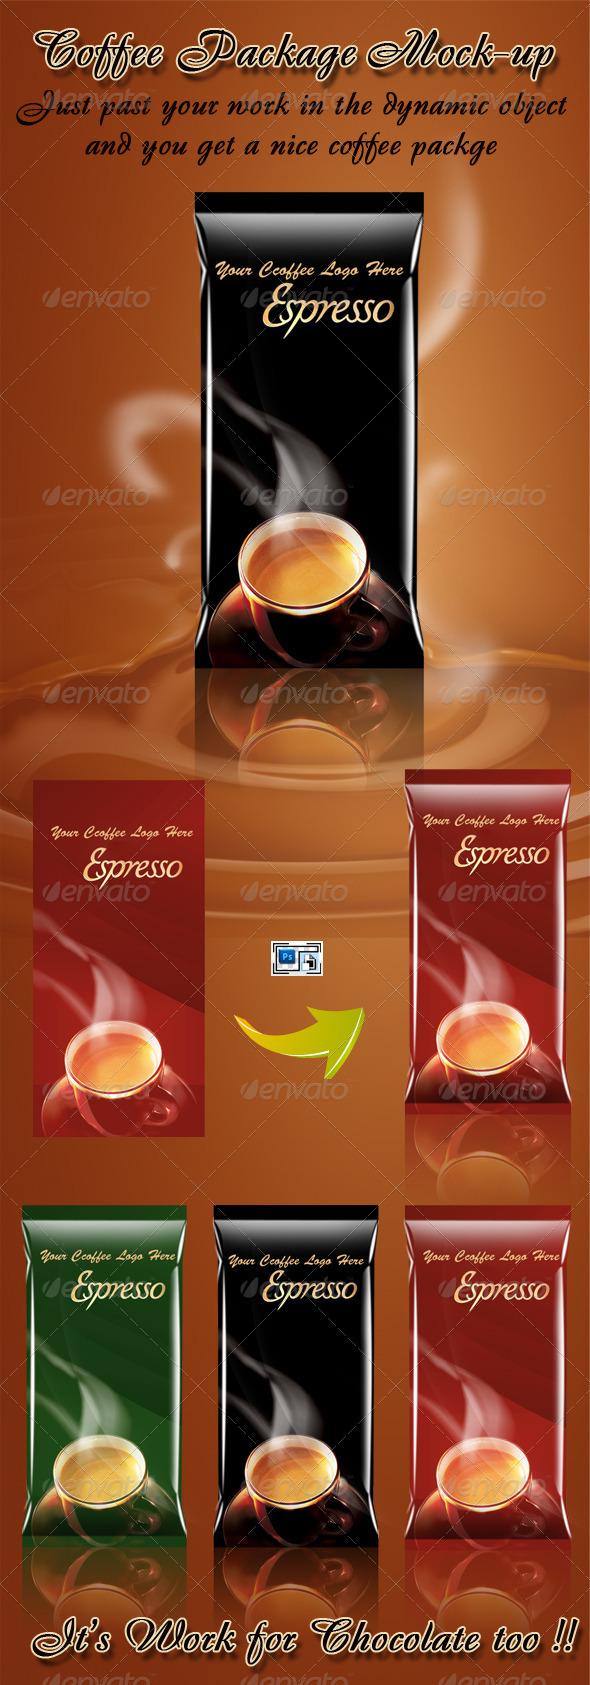 Coffee Package Mock-up - Food and Drink Packaging